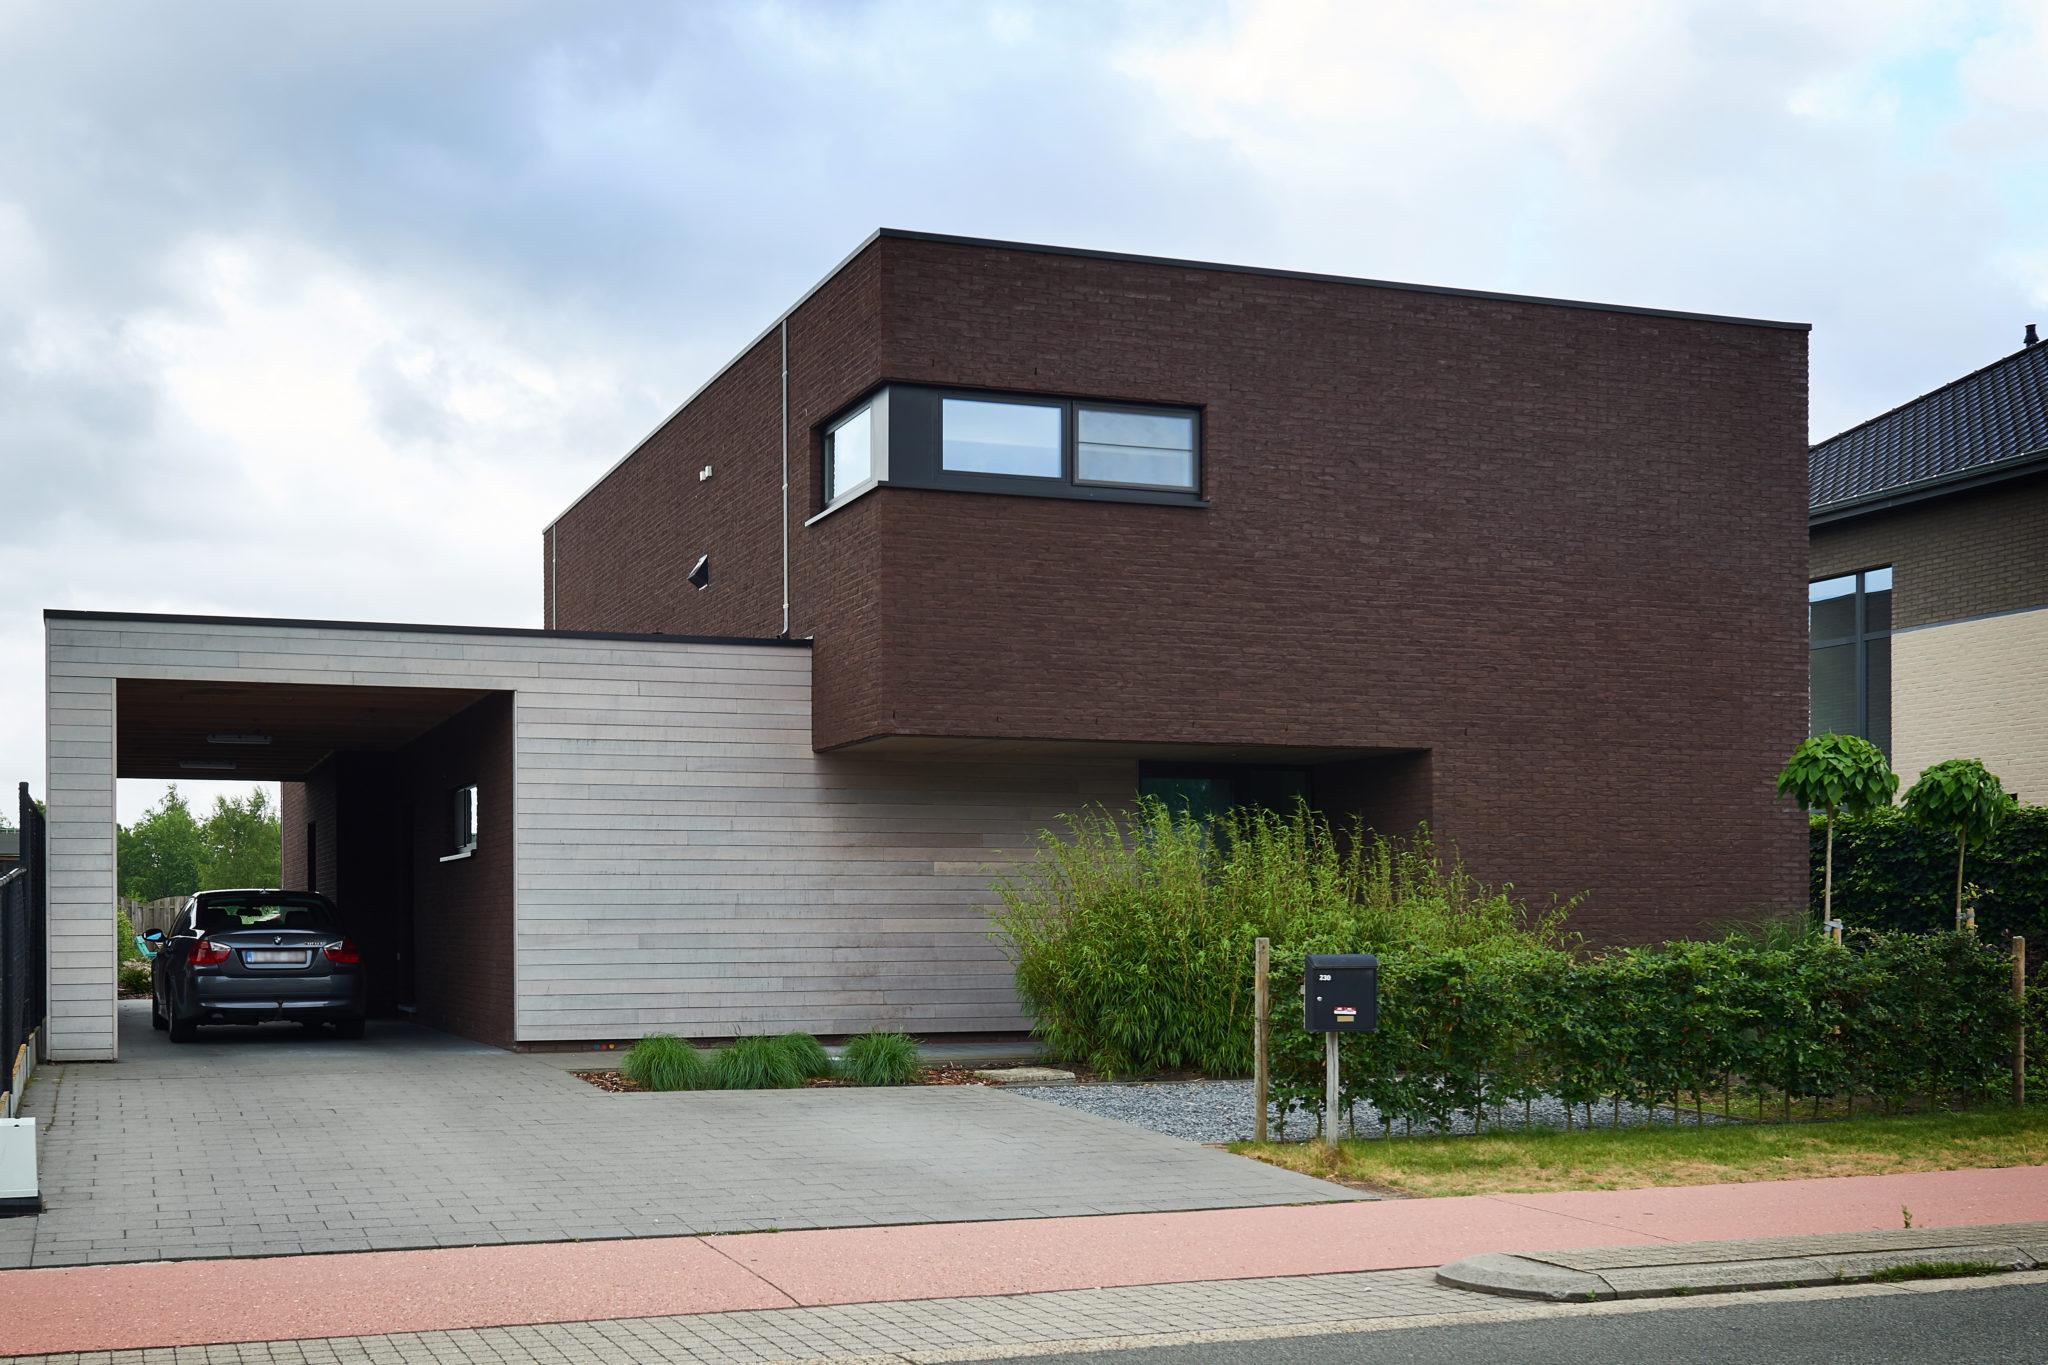 Eengezinswoning lommel architectenbureau jessi decsi for Moderne laagbouw woningen